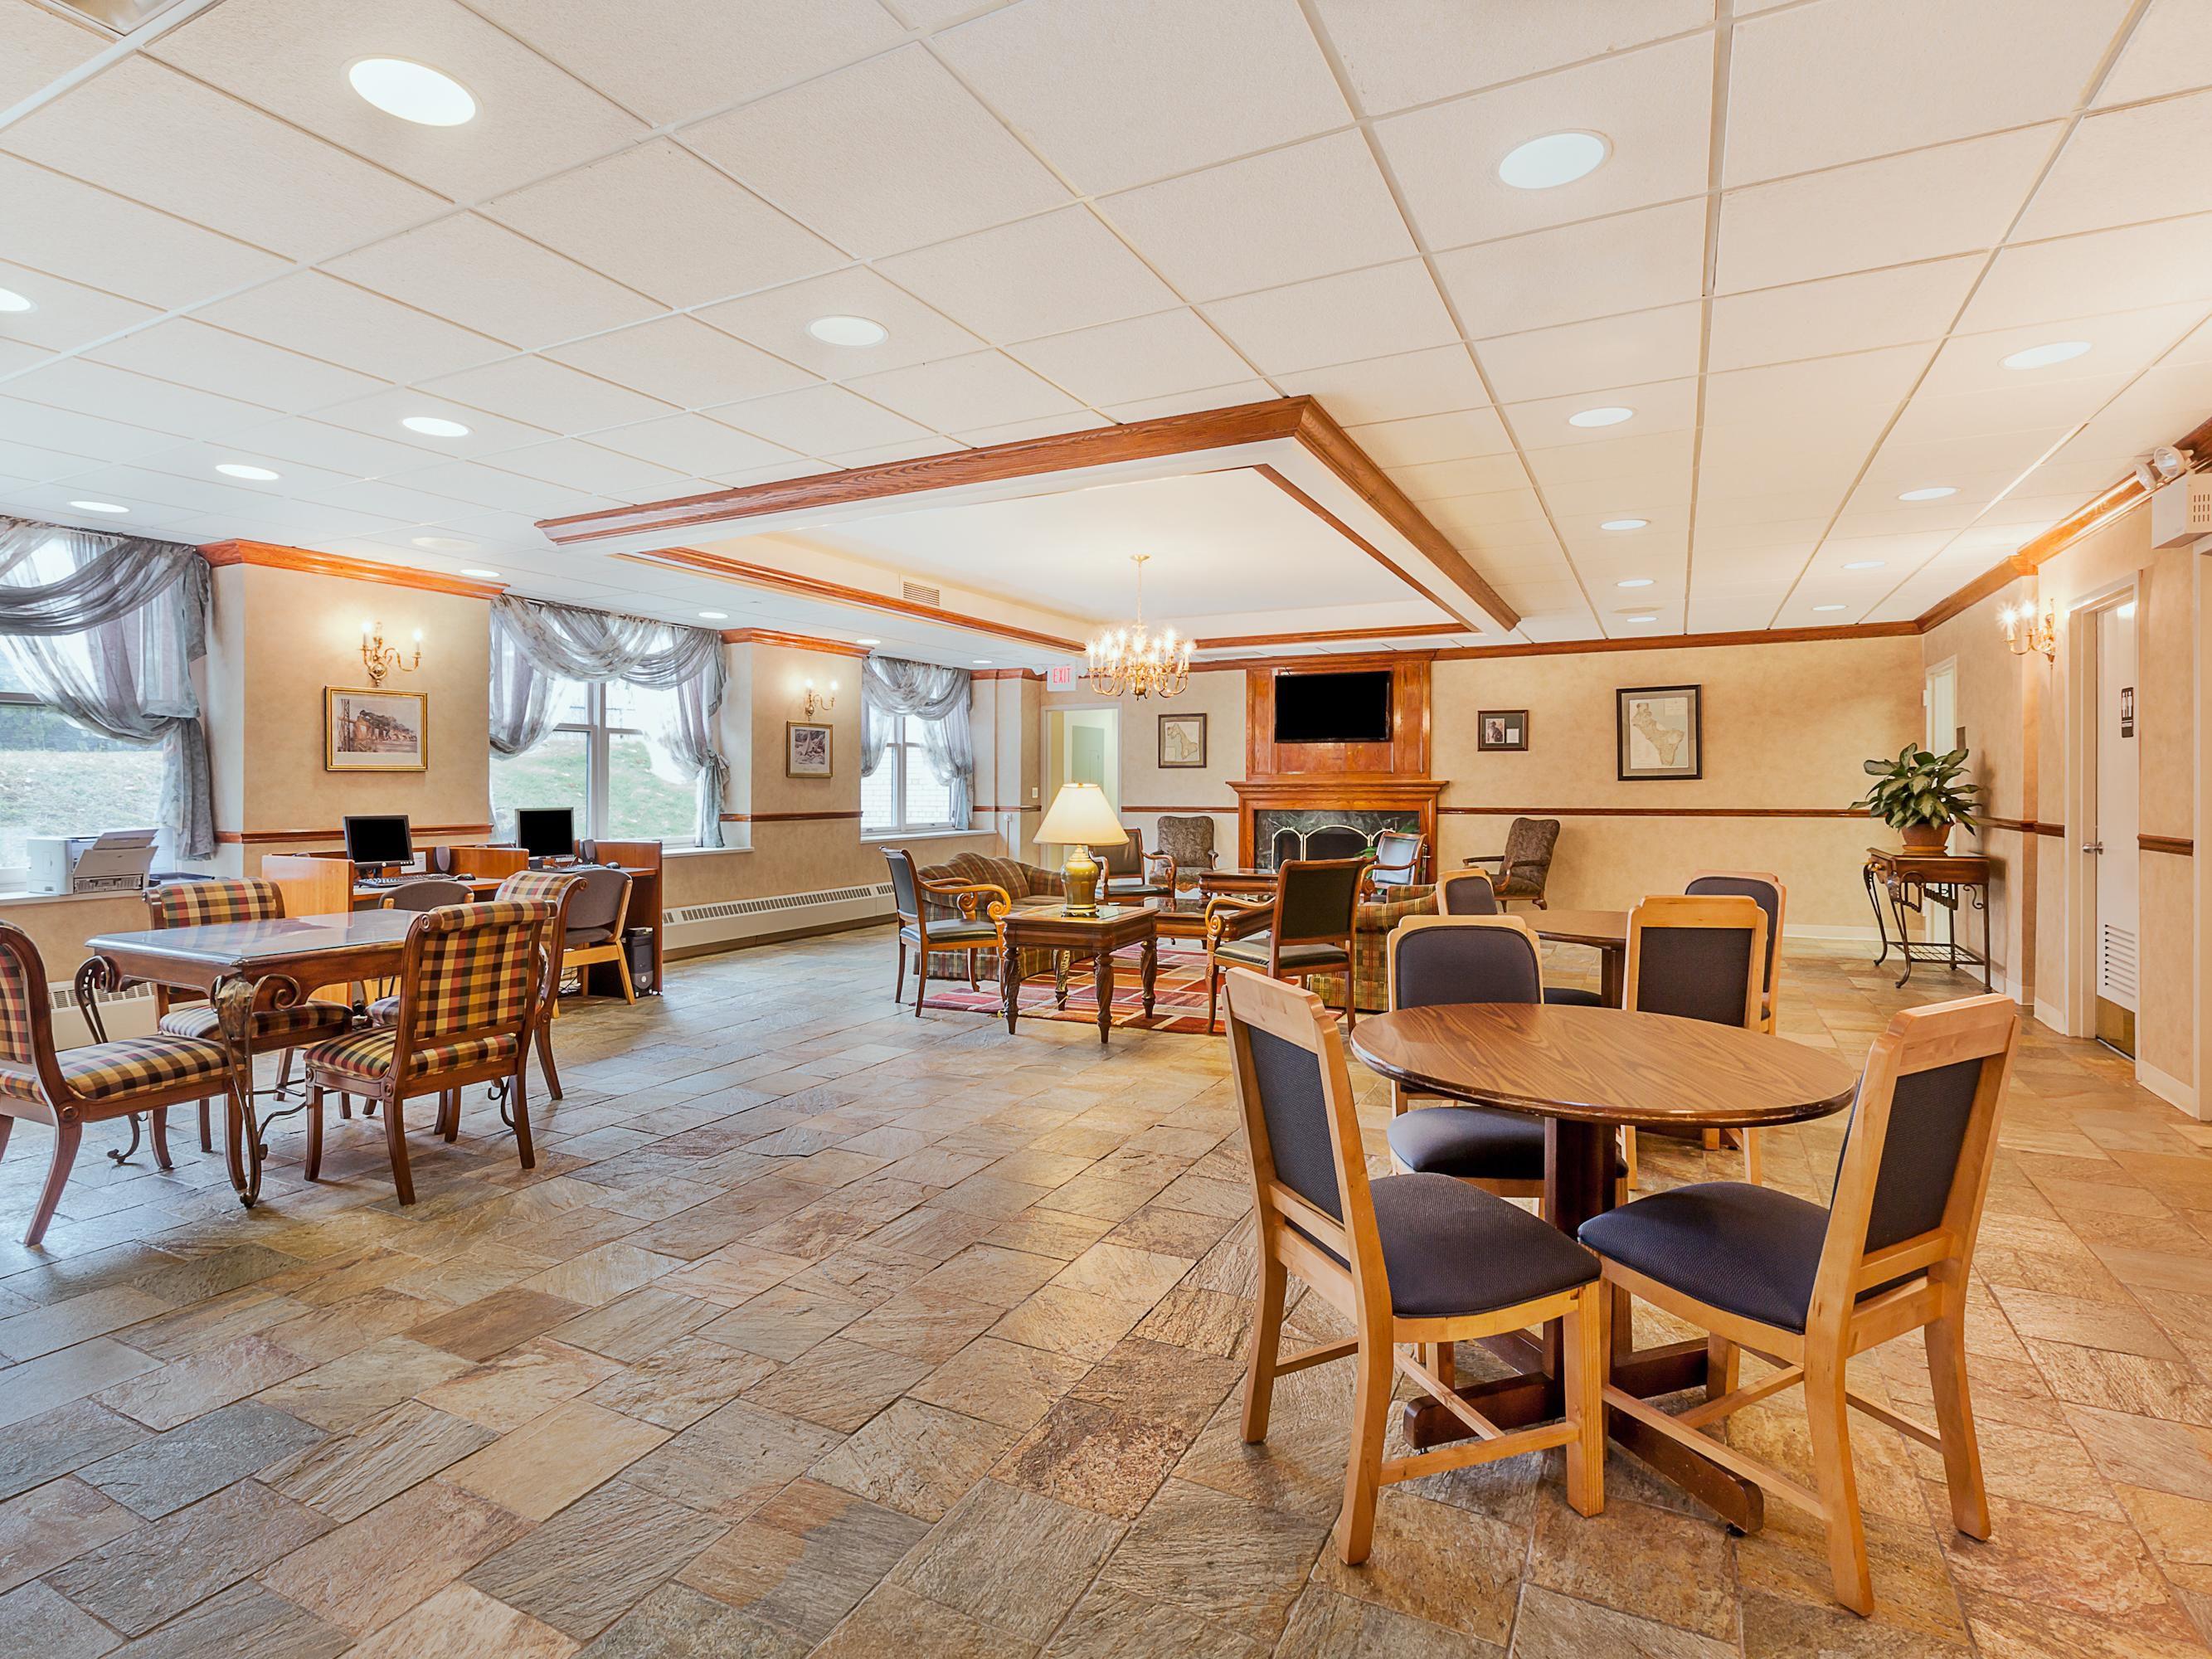 Hotel Lobby Of Bldg 2113